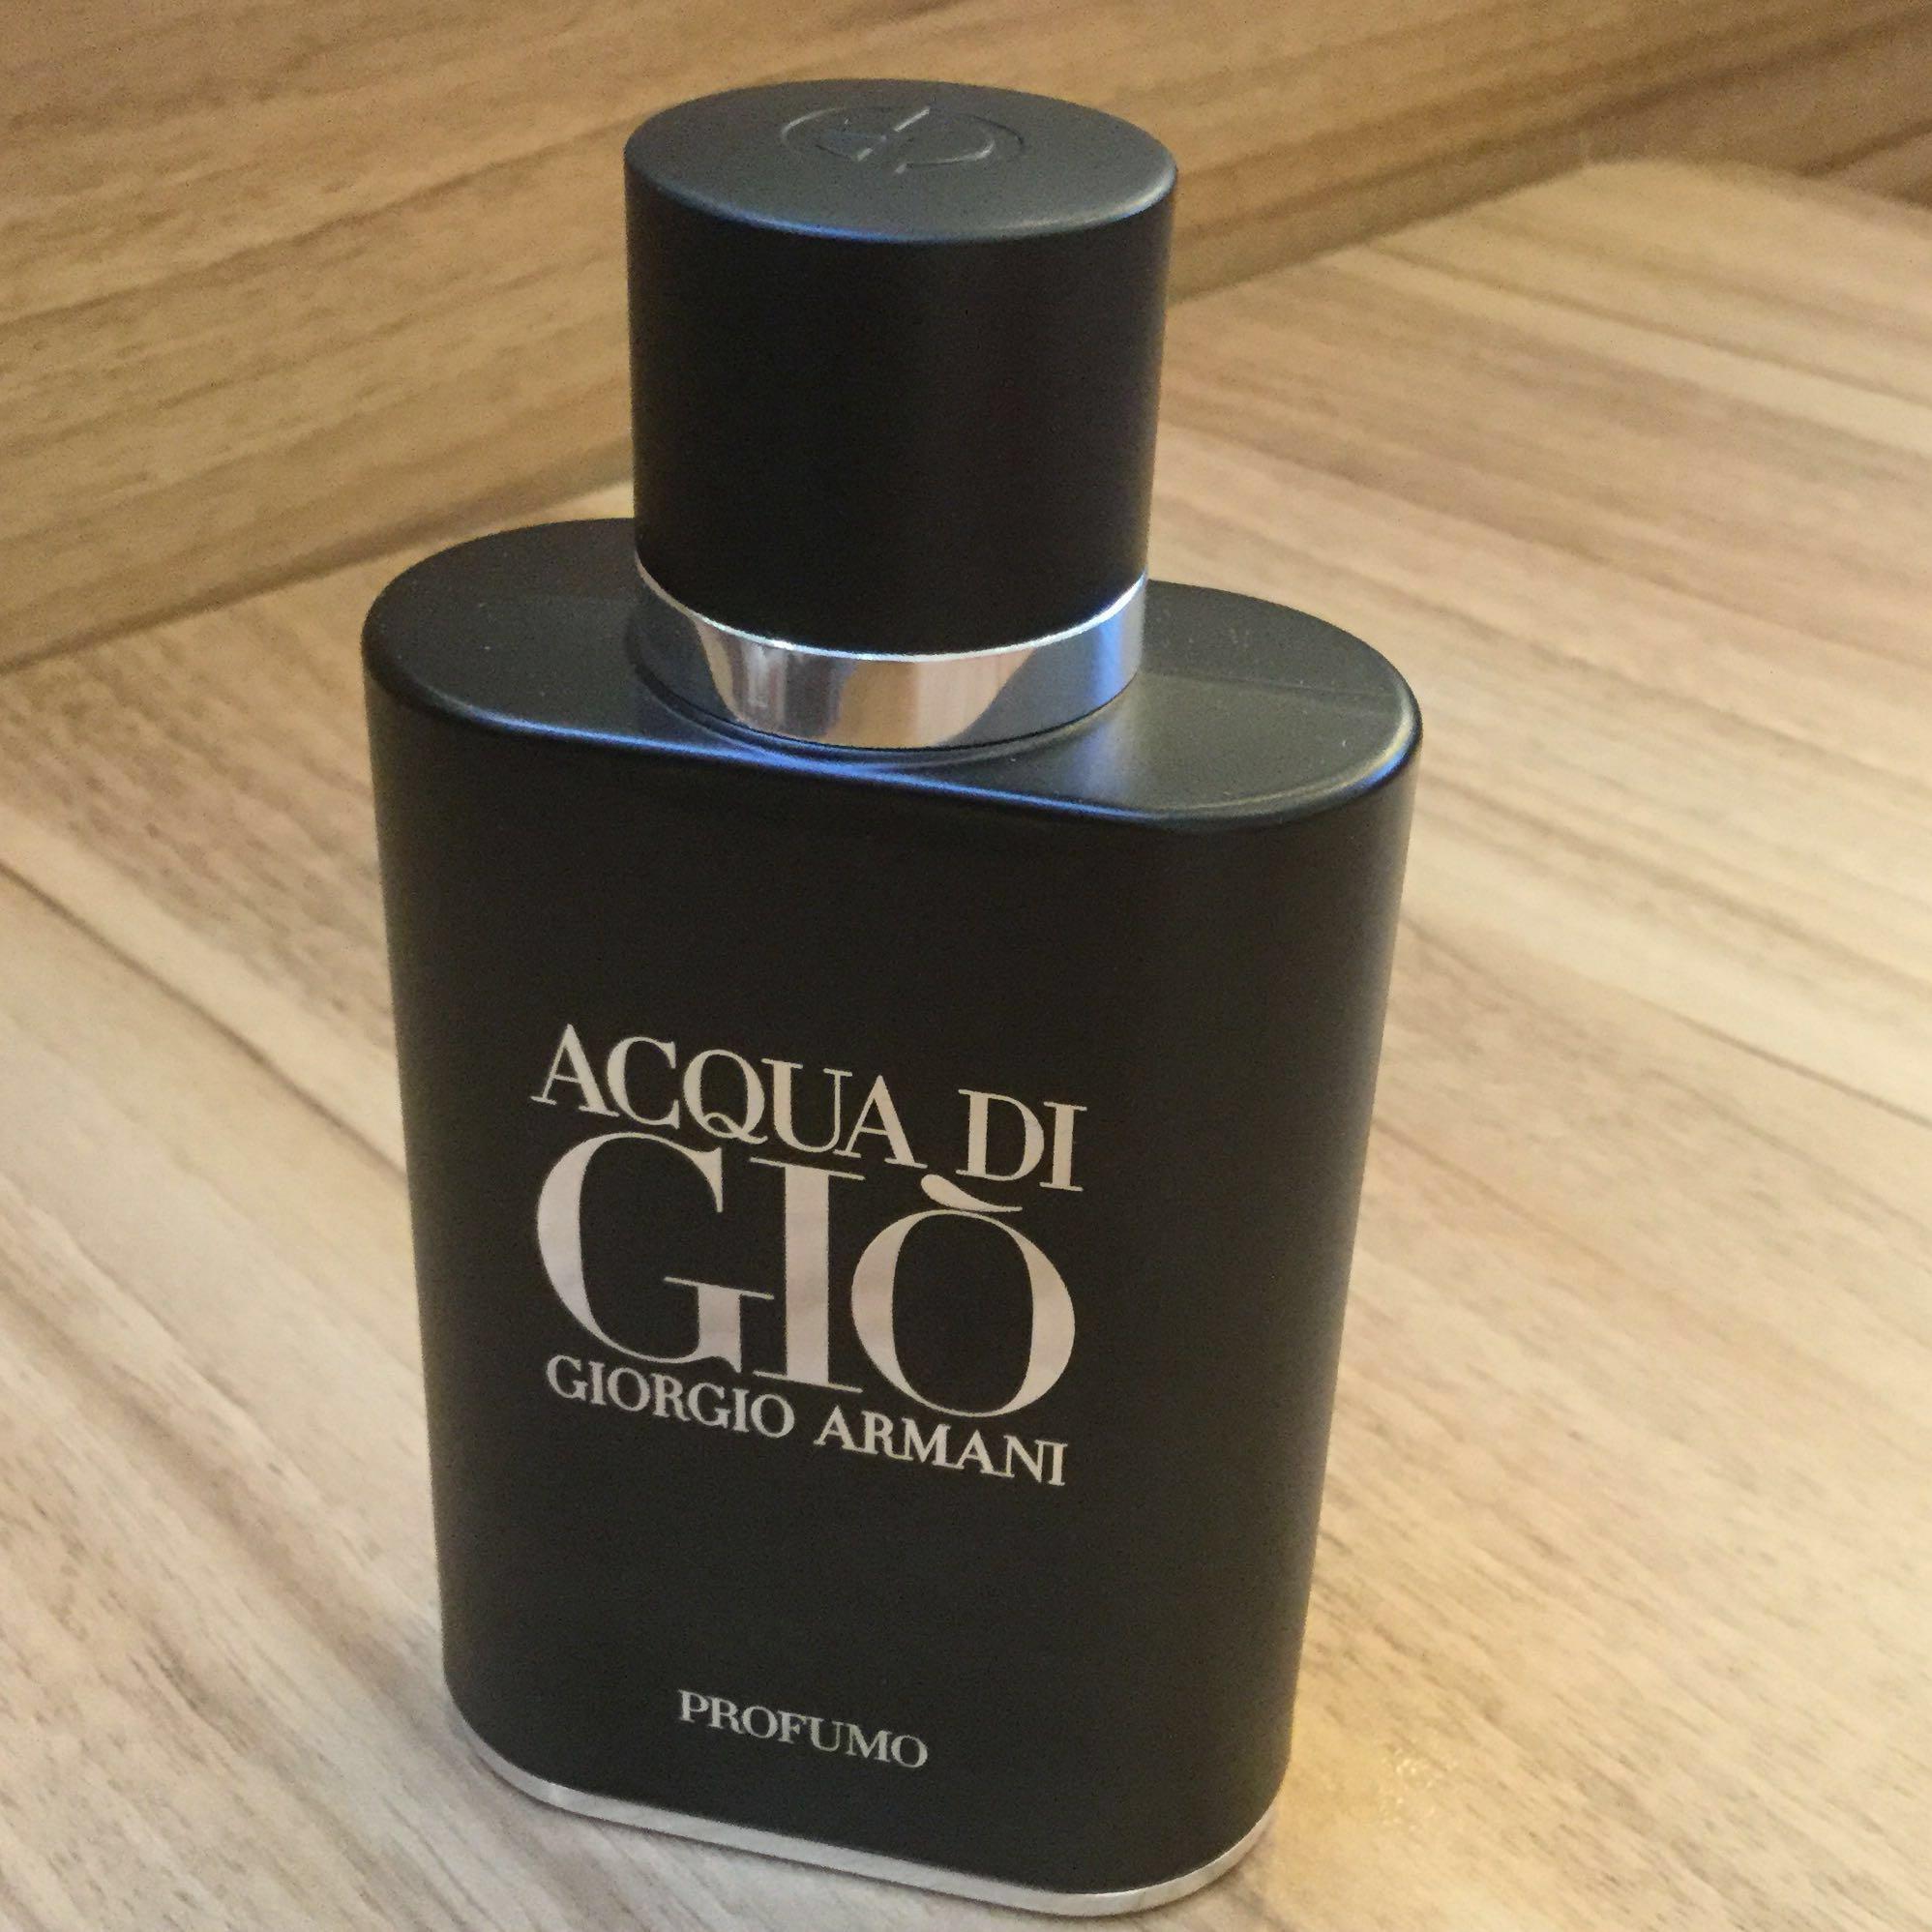 ProfumoHealthamp; Gio BeautyPerfumes Di Armani Acqua Giorgio XikuPZ